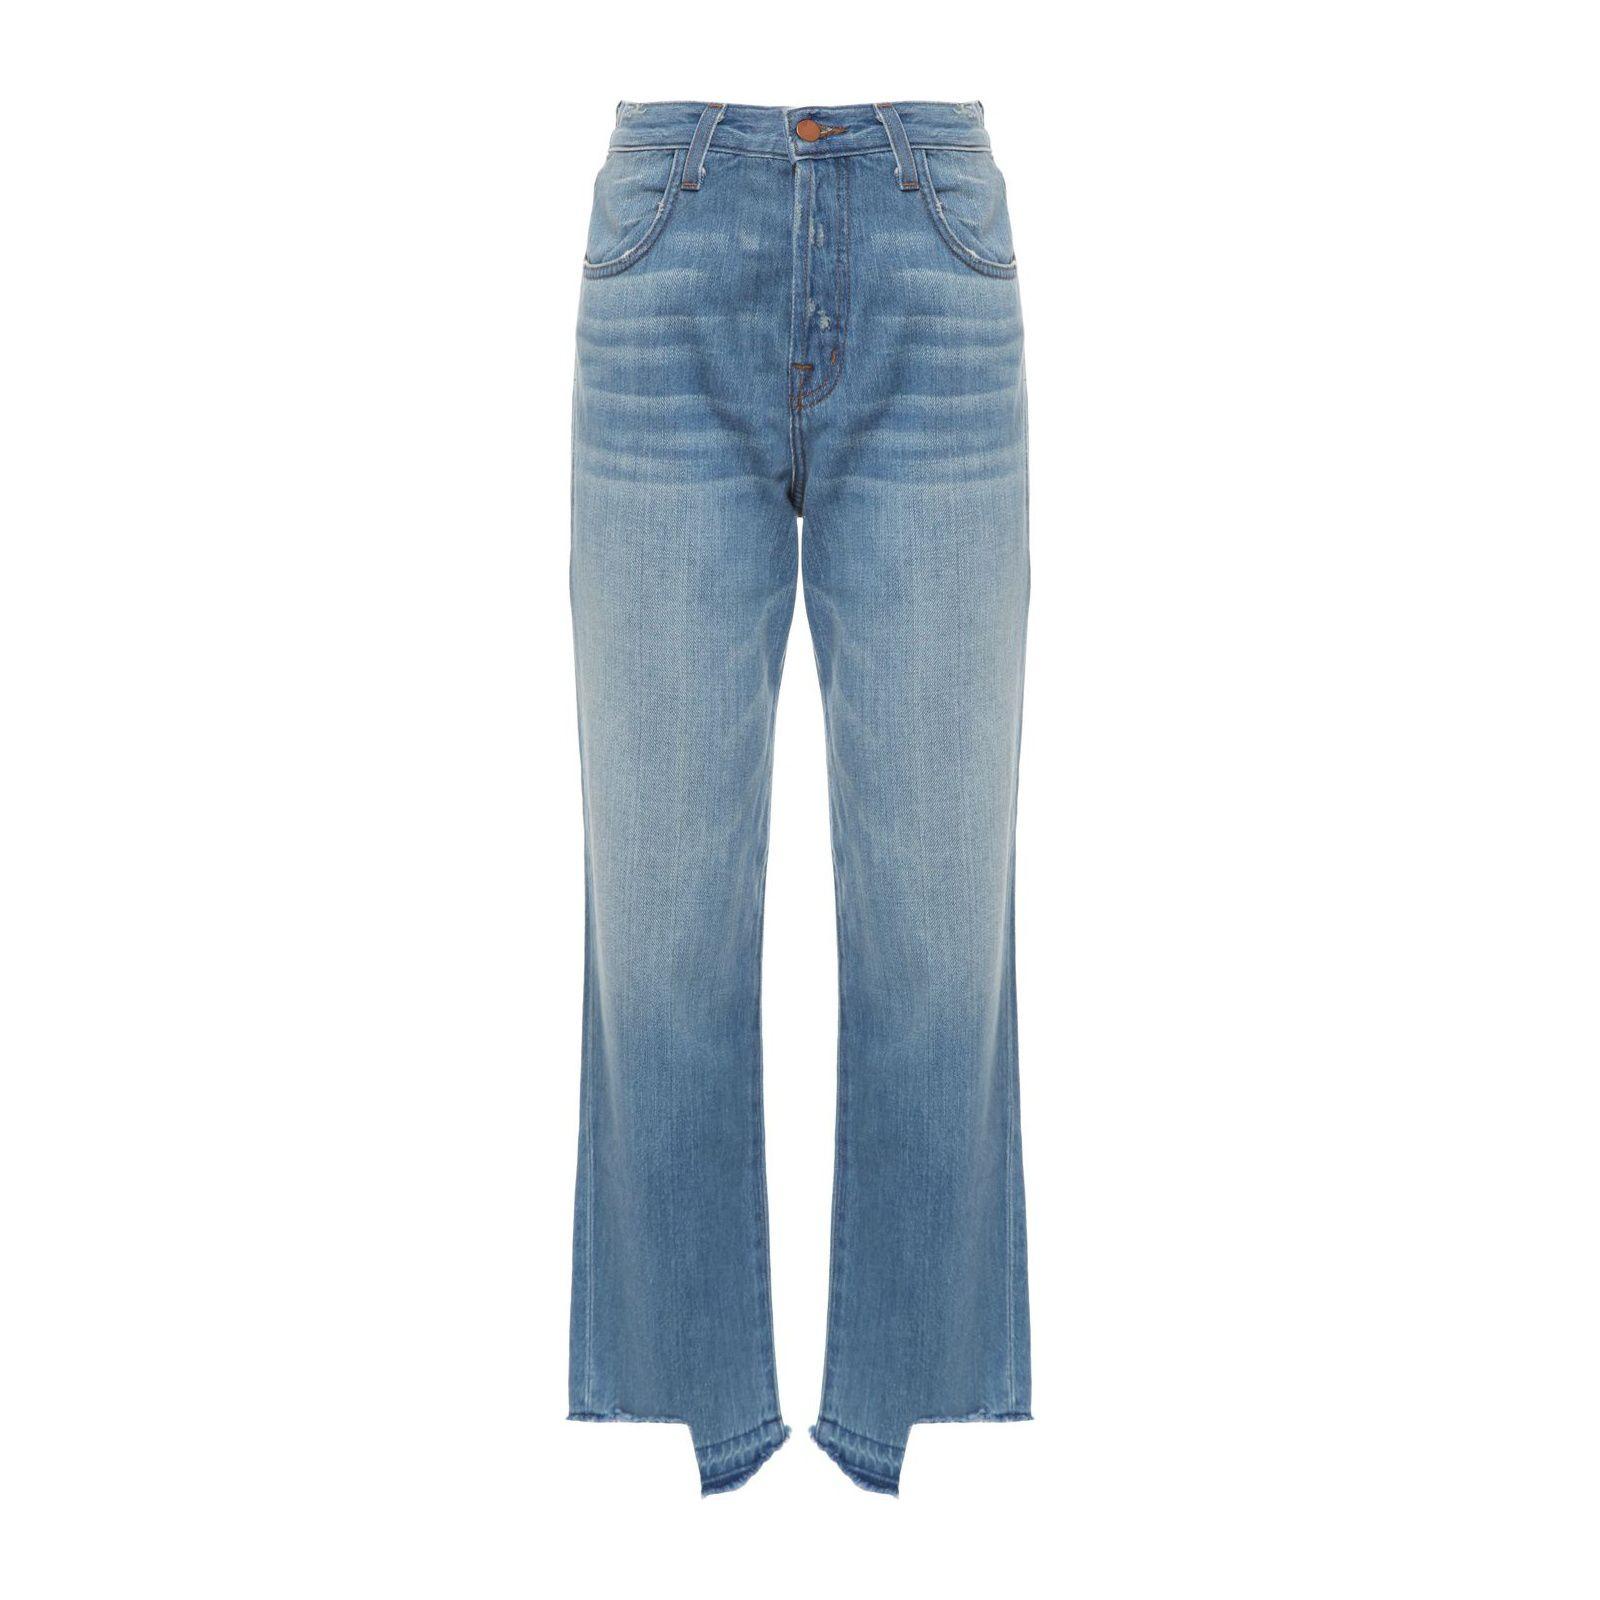 Calça Jeans Ivy High Rise Crop Straight - Azul